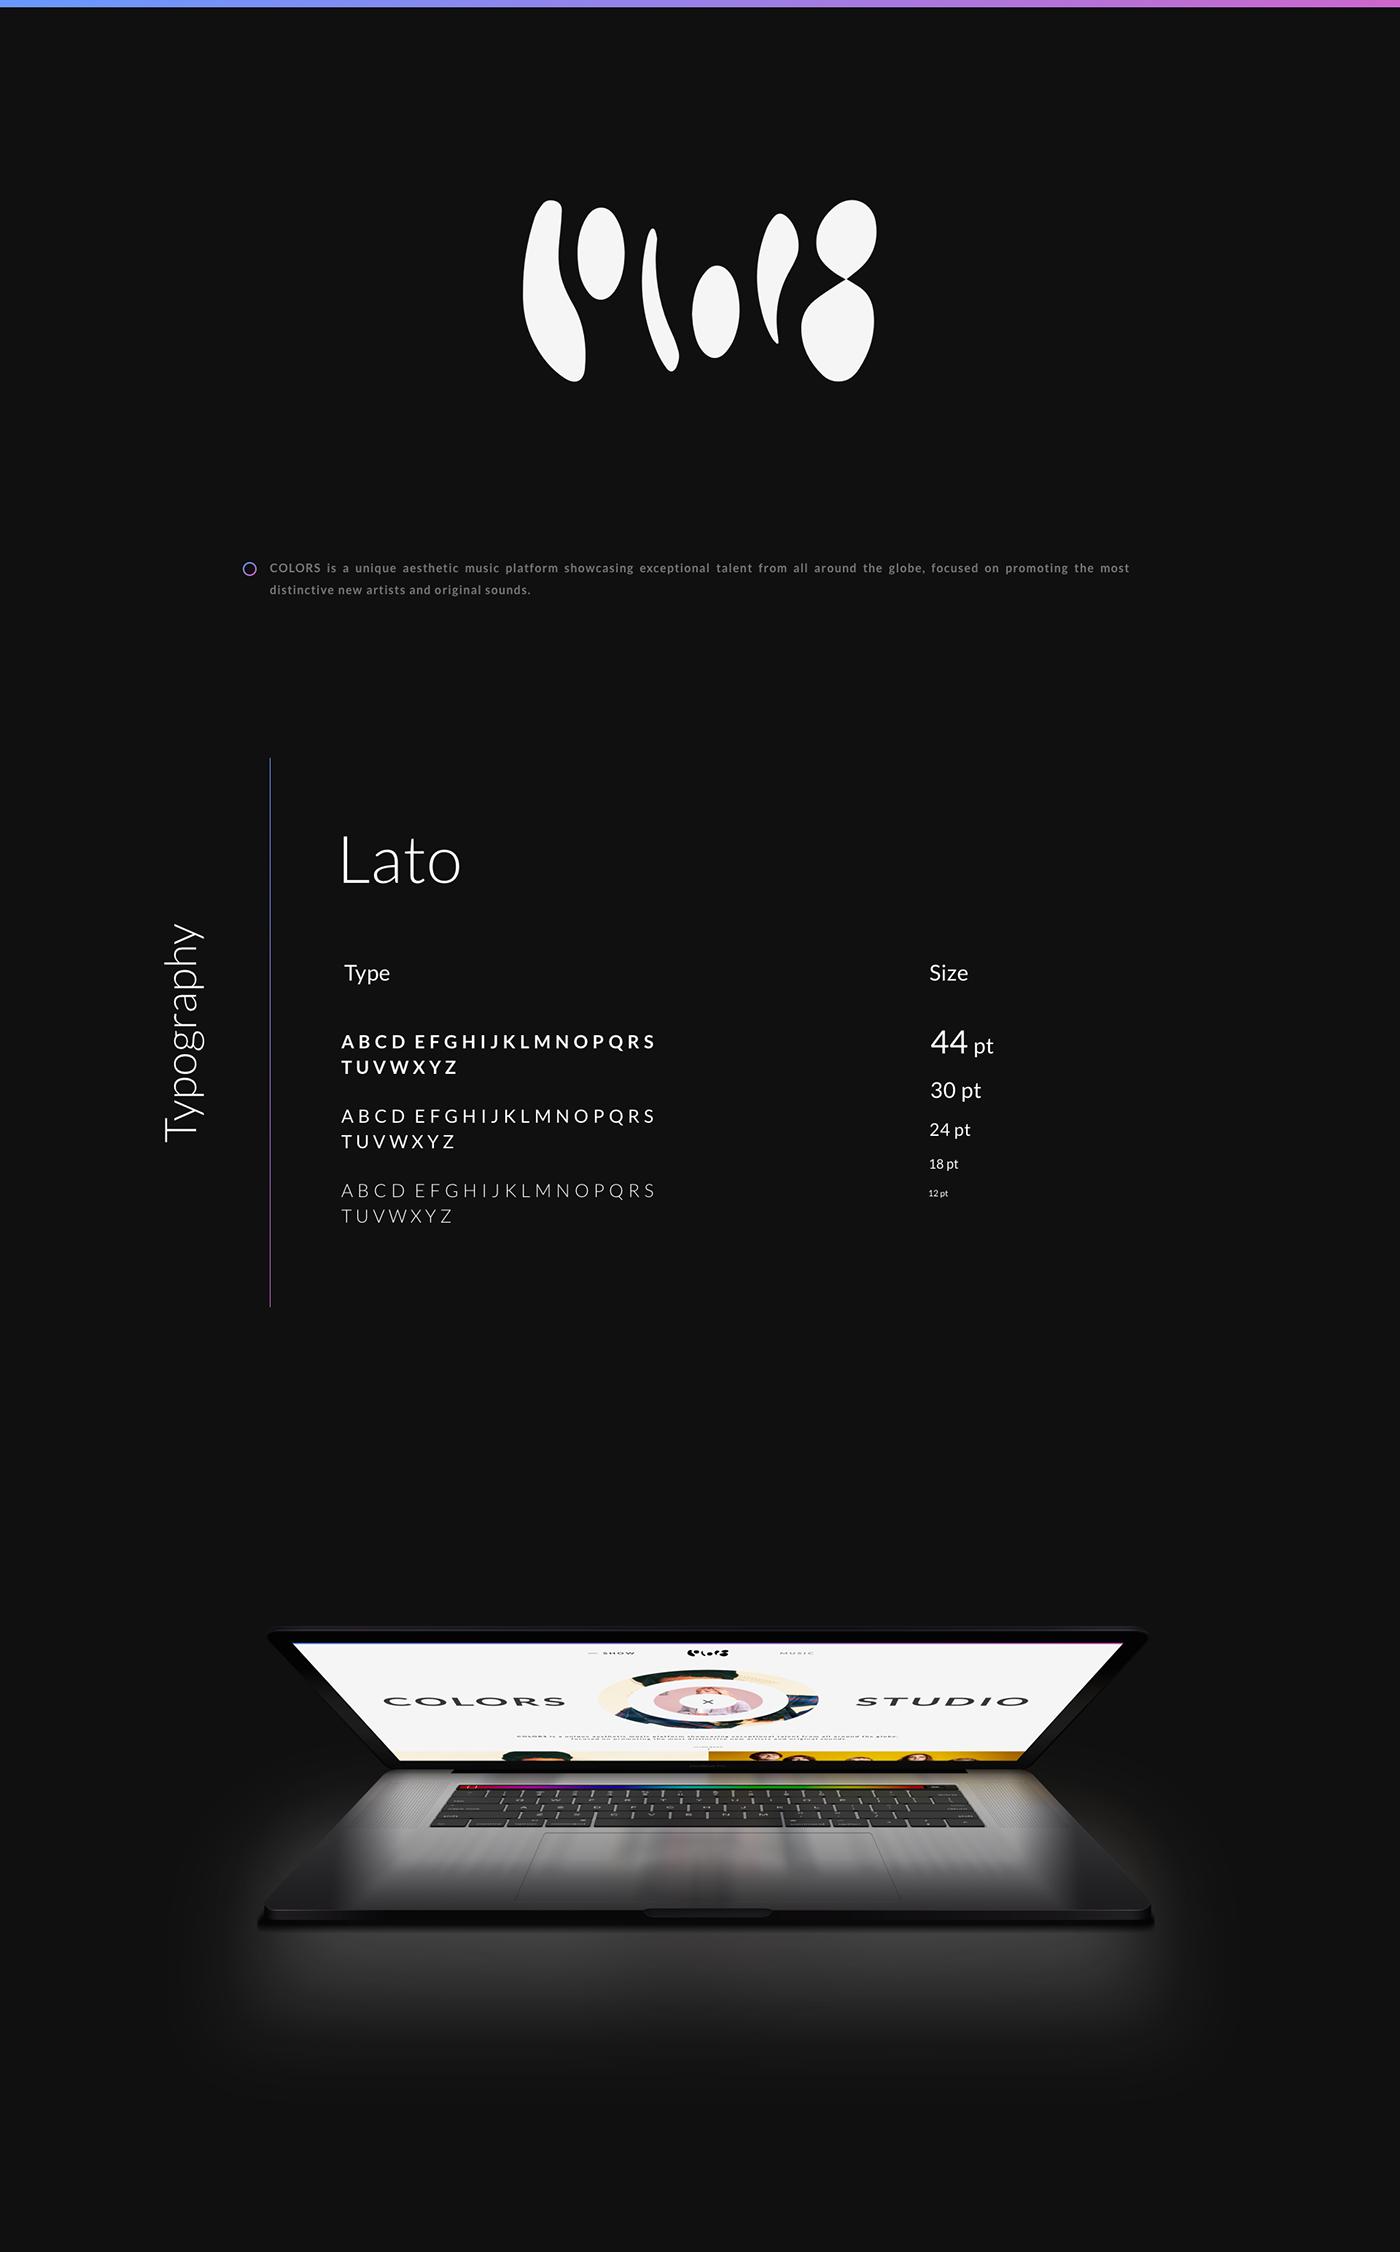 ux UI design Web colors minimalist aesthetic new redesign